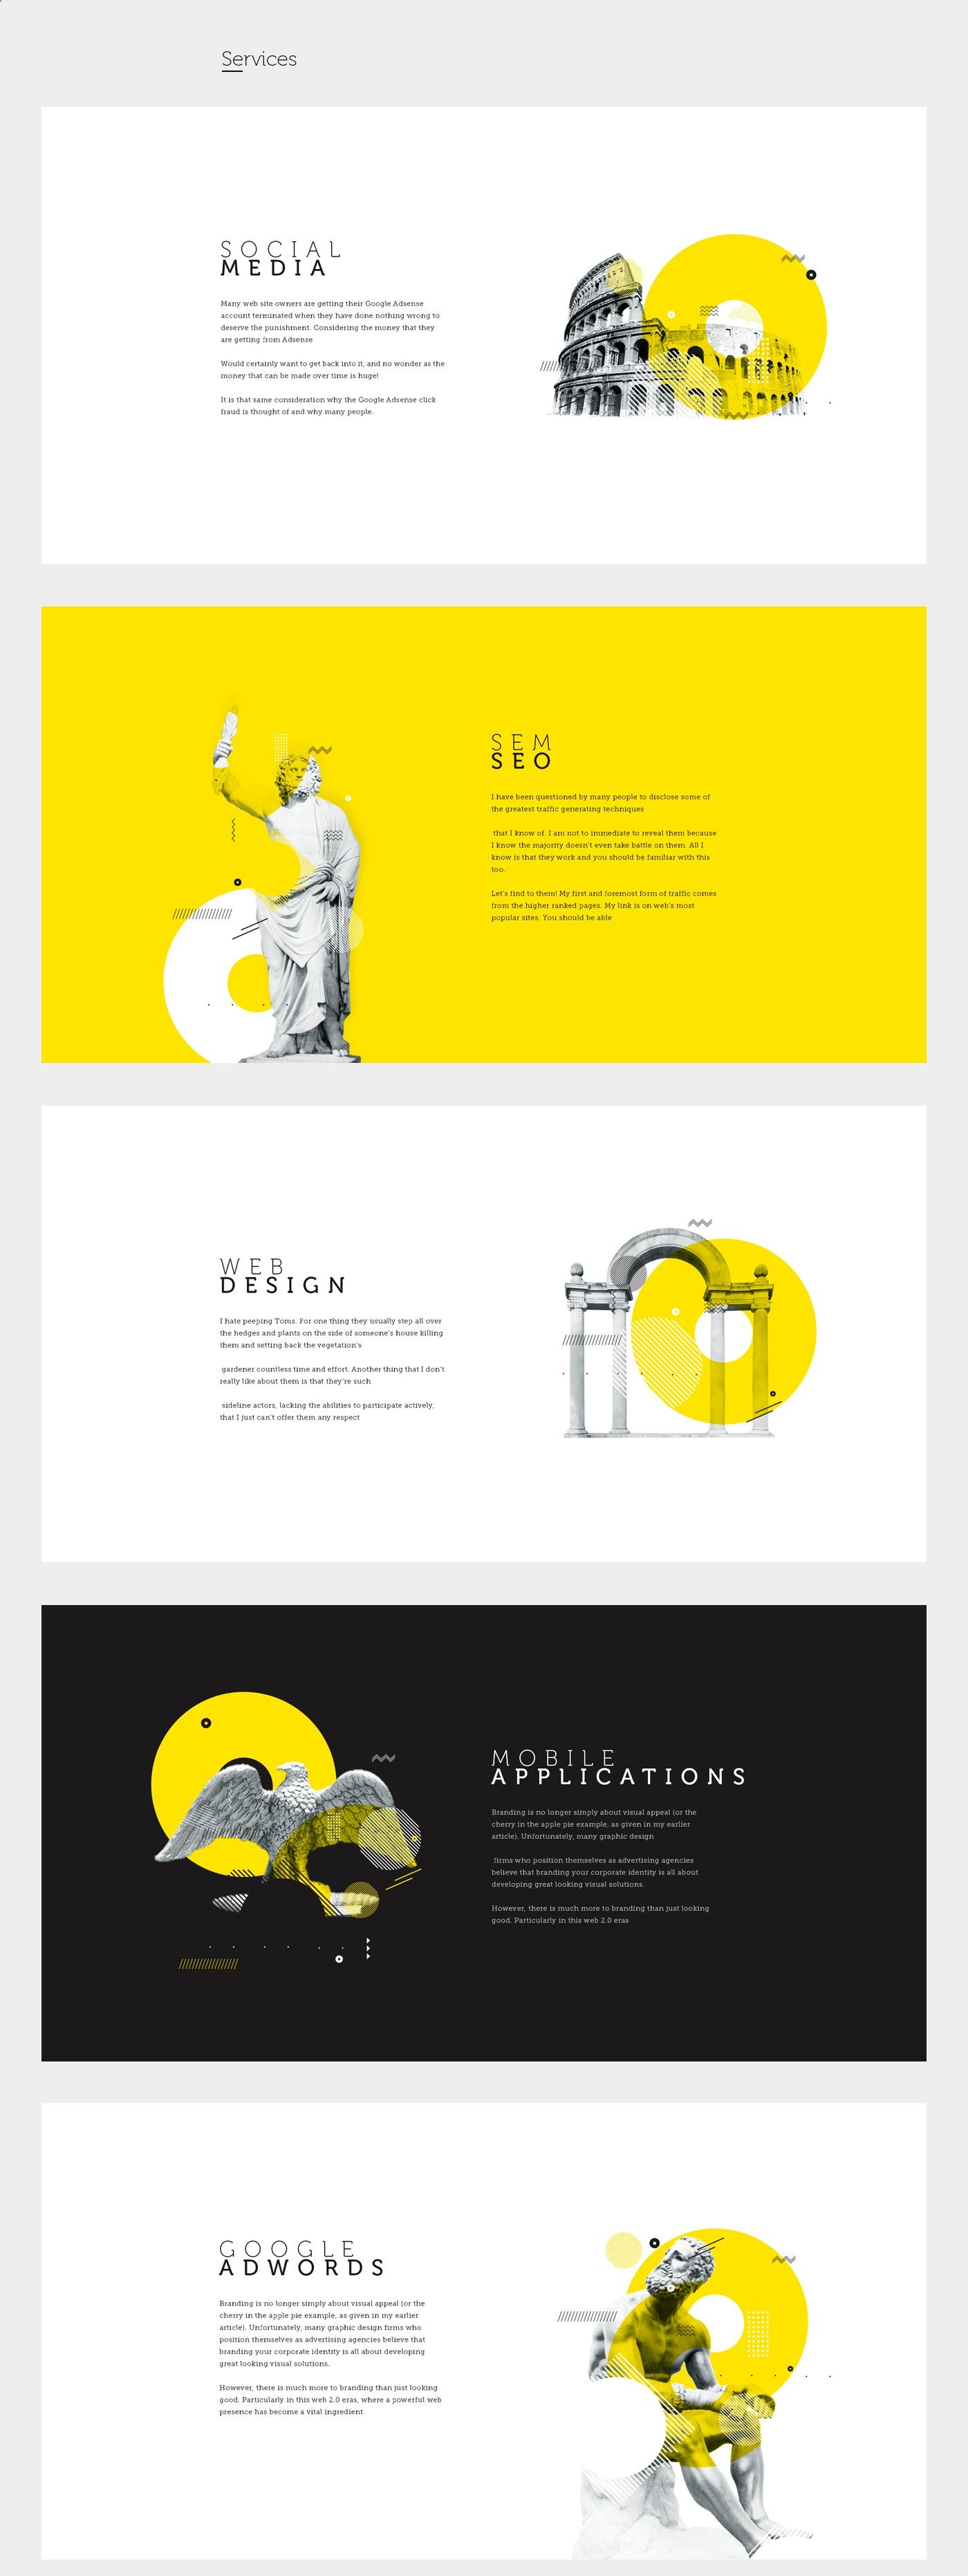 Dottopia Web Design For Graphics Services Yellow Website Brendbuk Dizajn Karty Dizajn Prezentacii